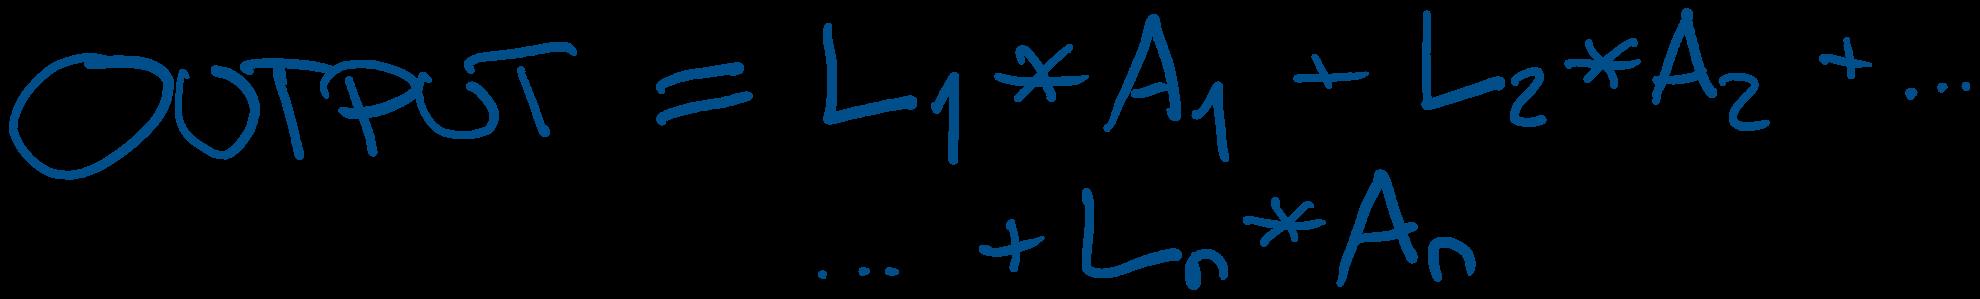 The Output Equation